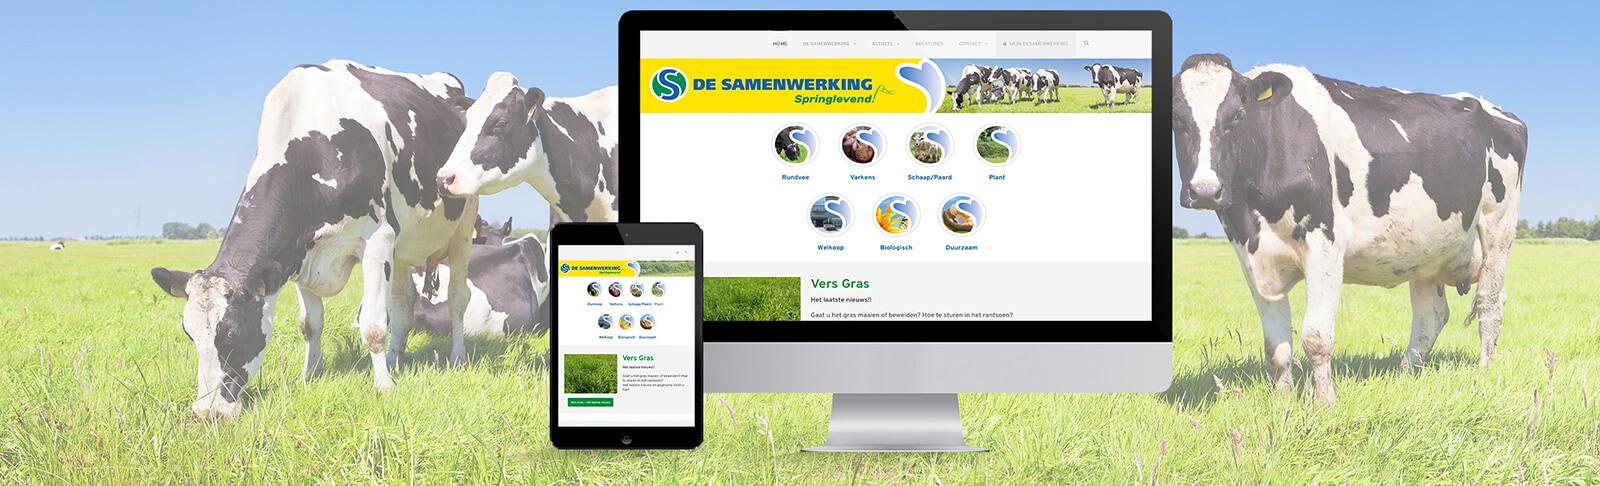 portfolio-de-samenwerking-website